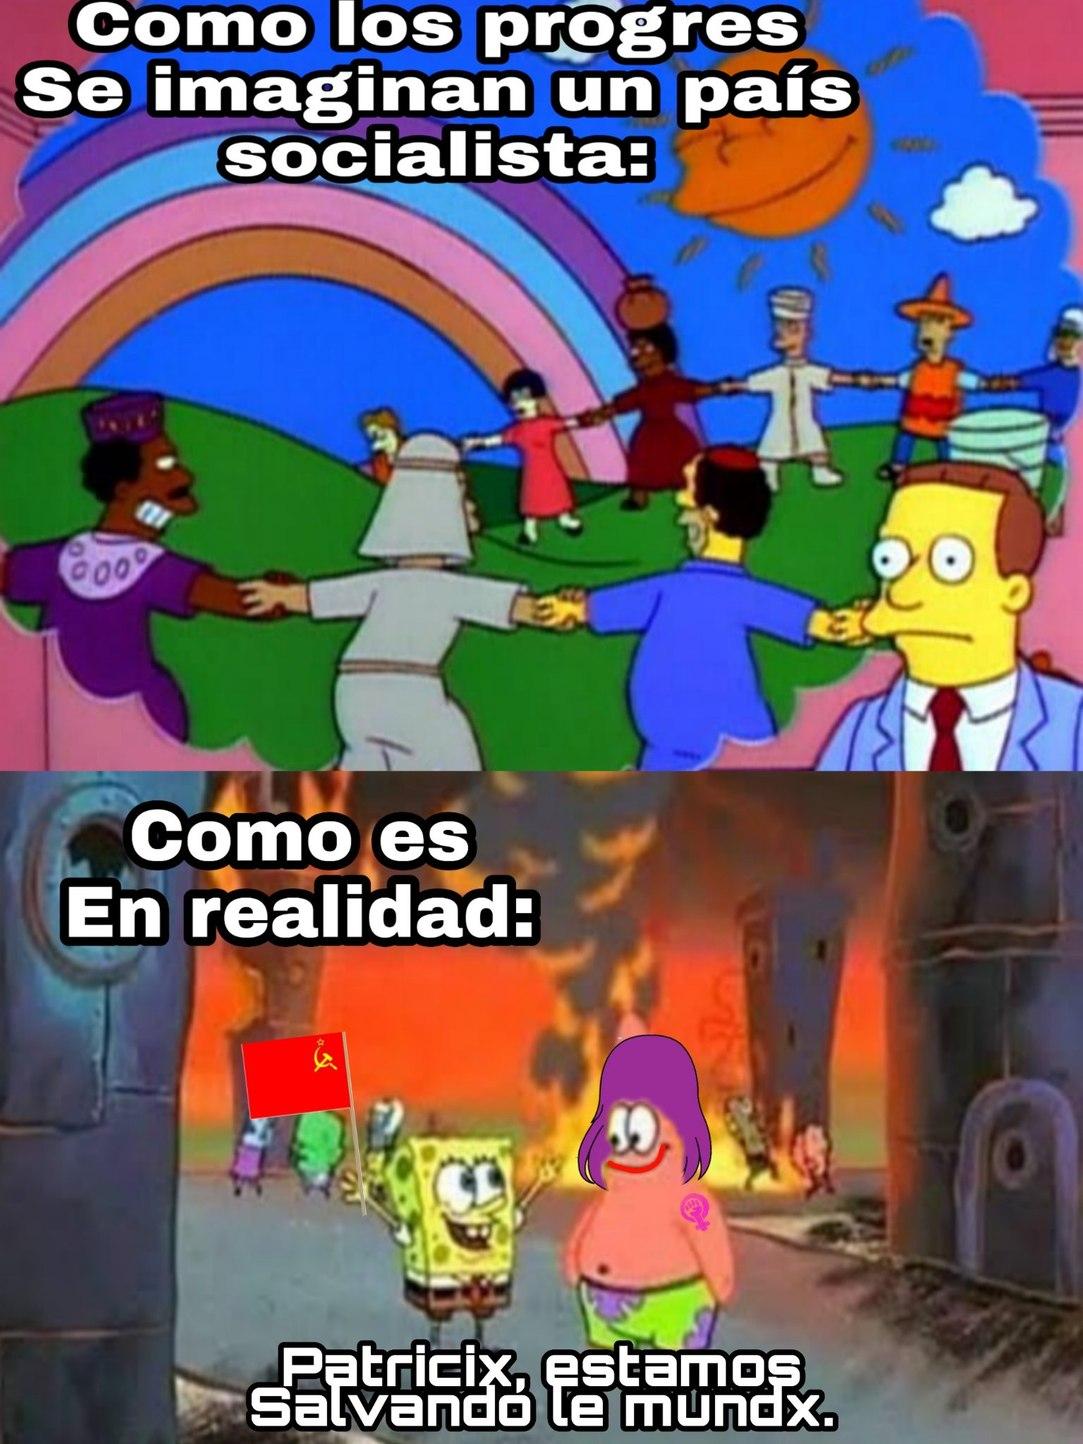 Antigiliprogres - meme